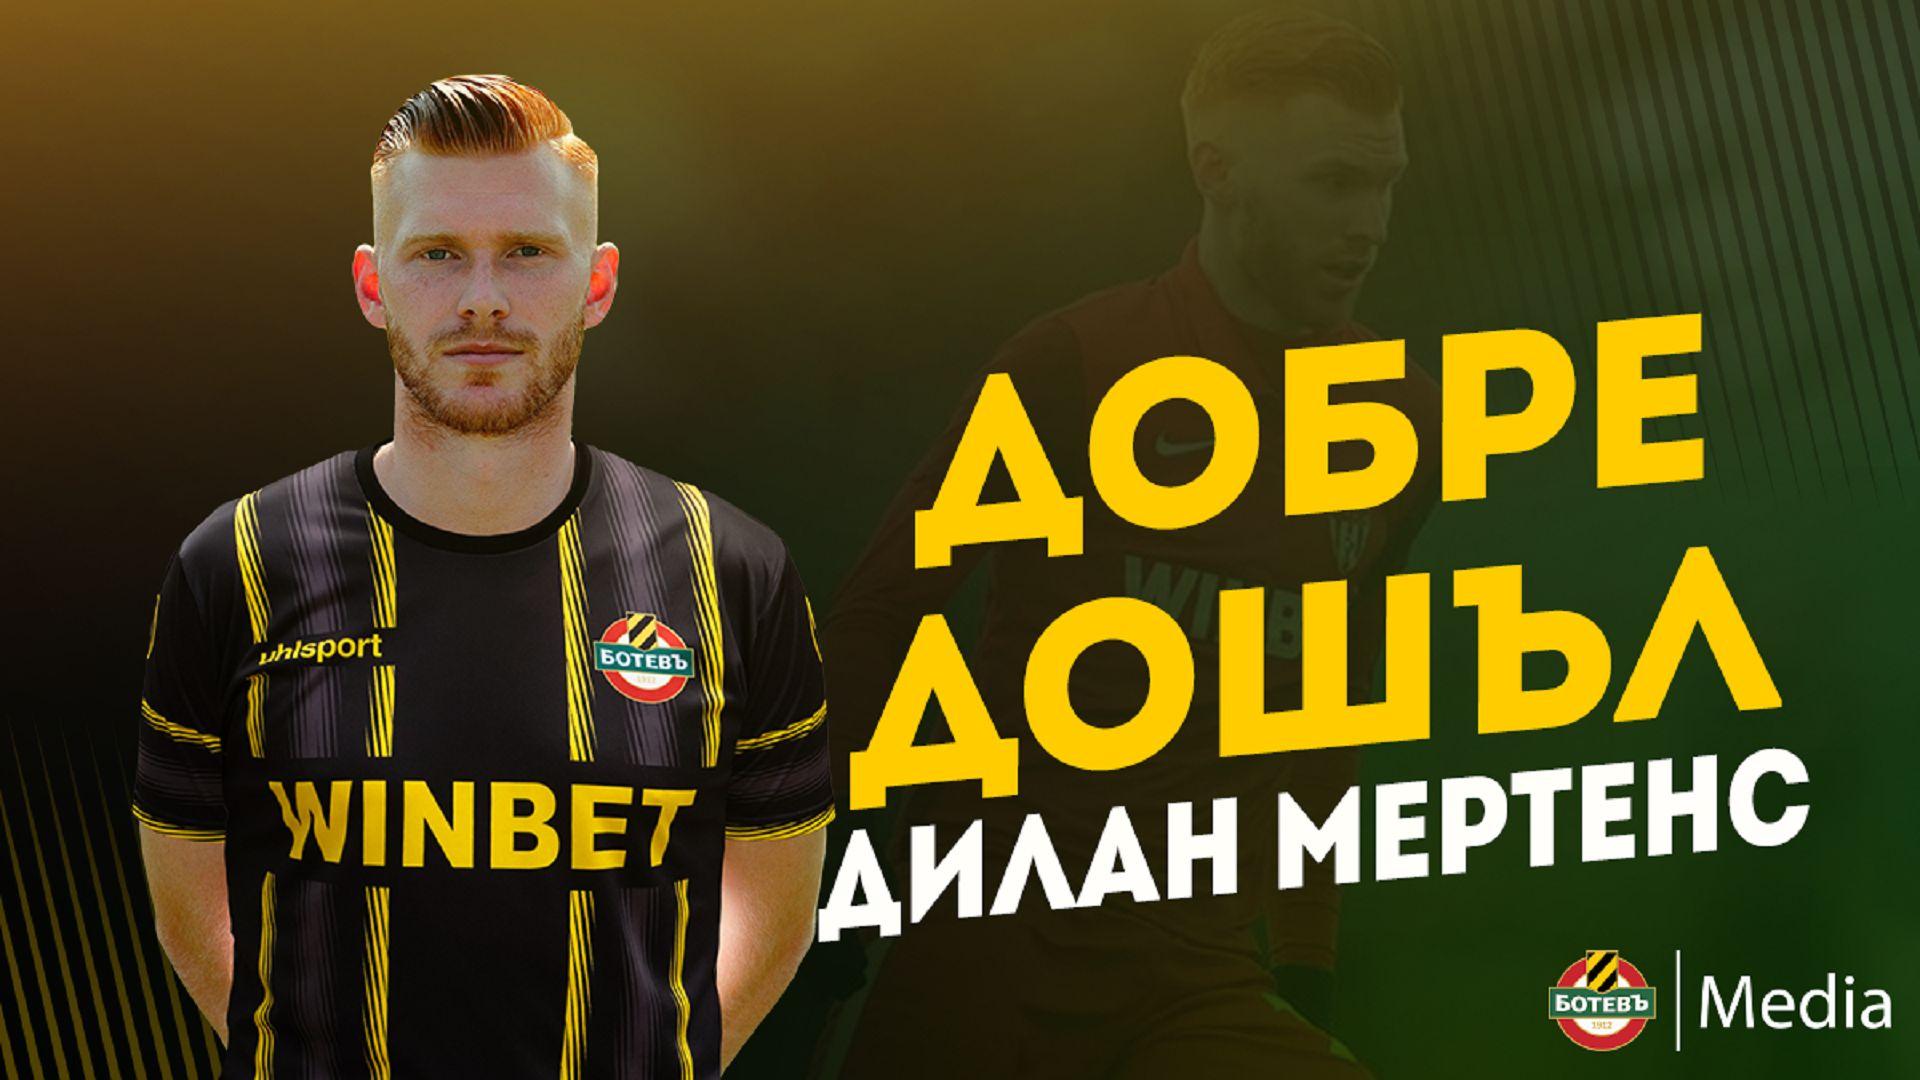 Ботев (Пловдив) се похвали със силен трансфер